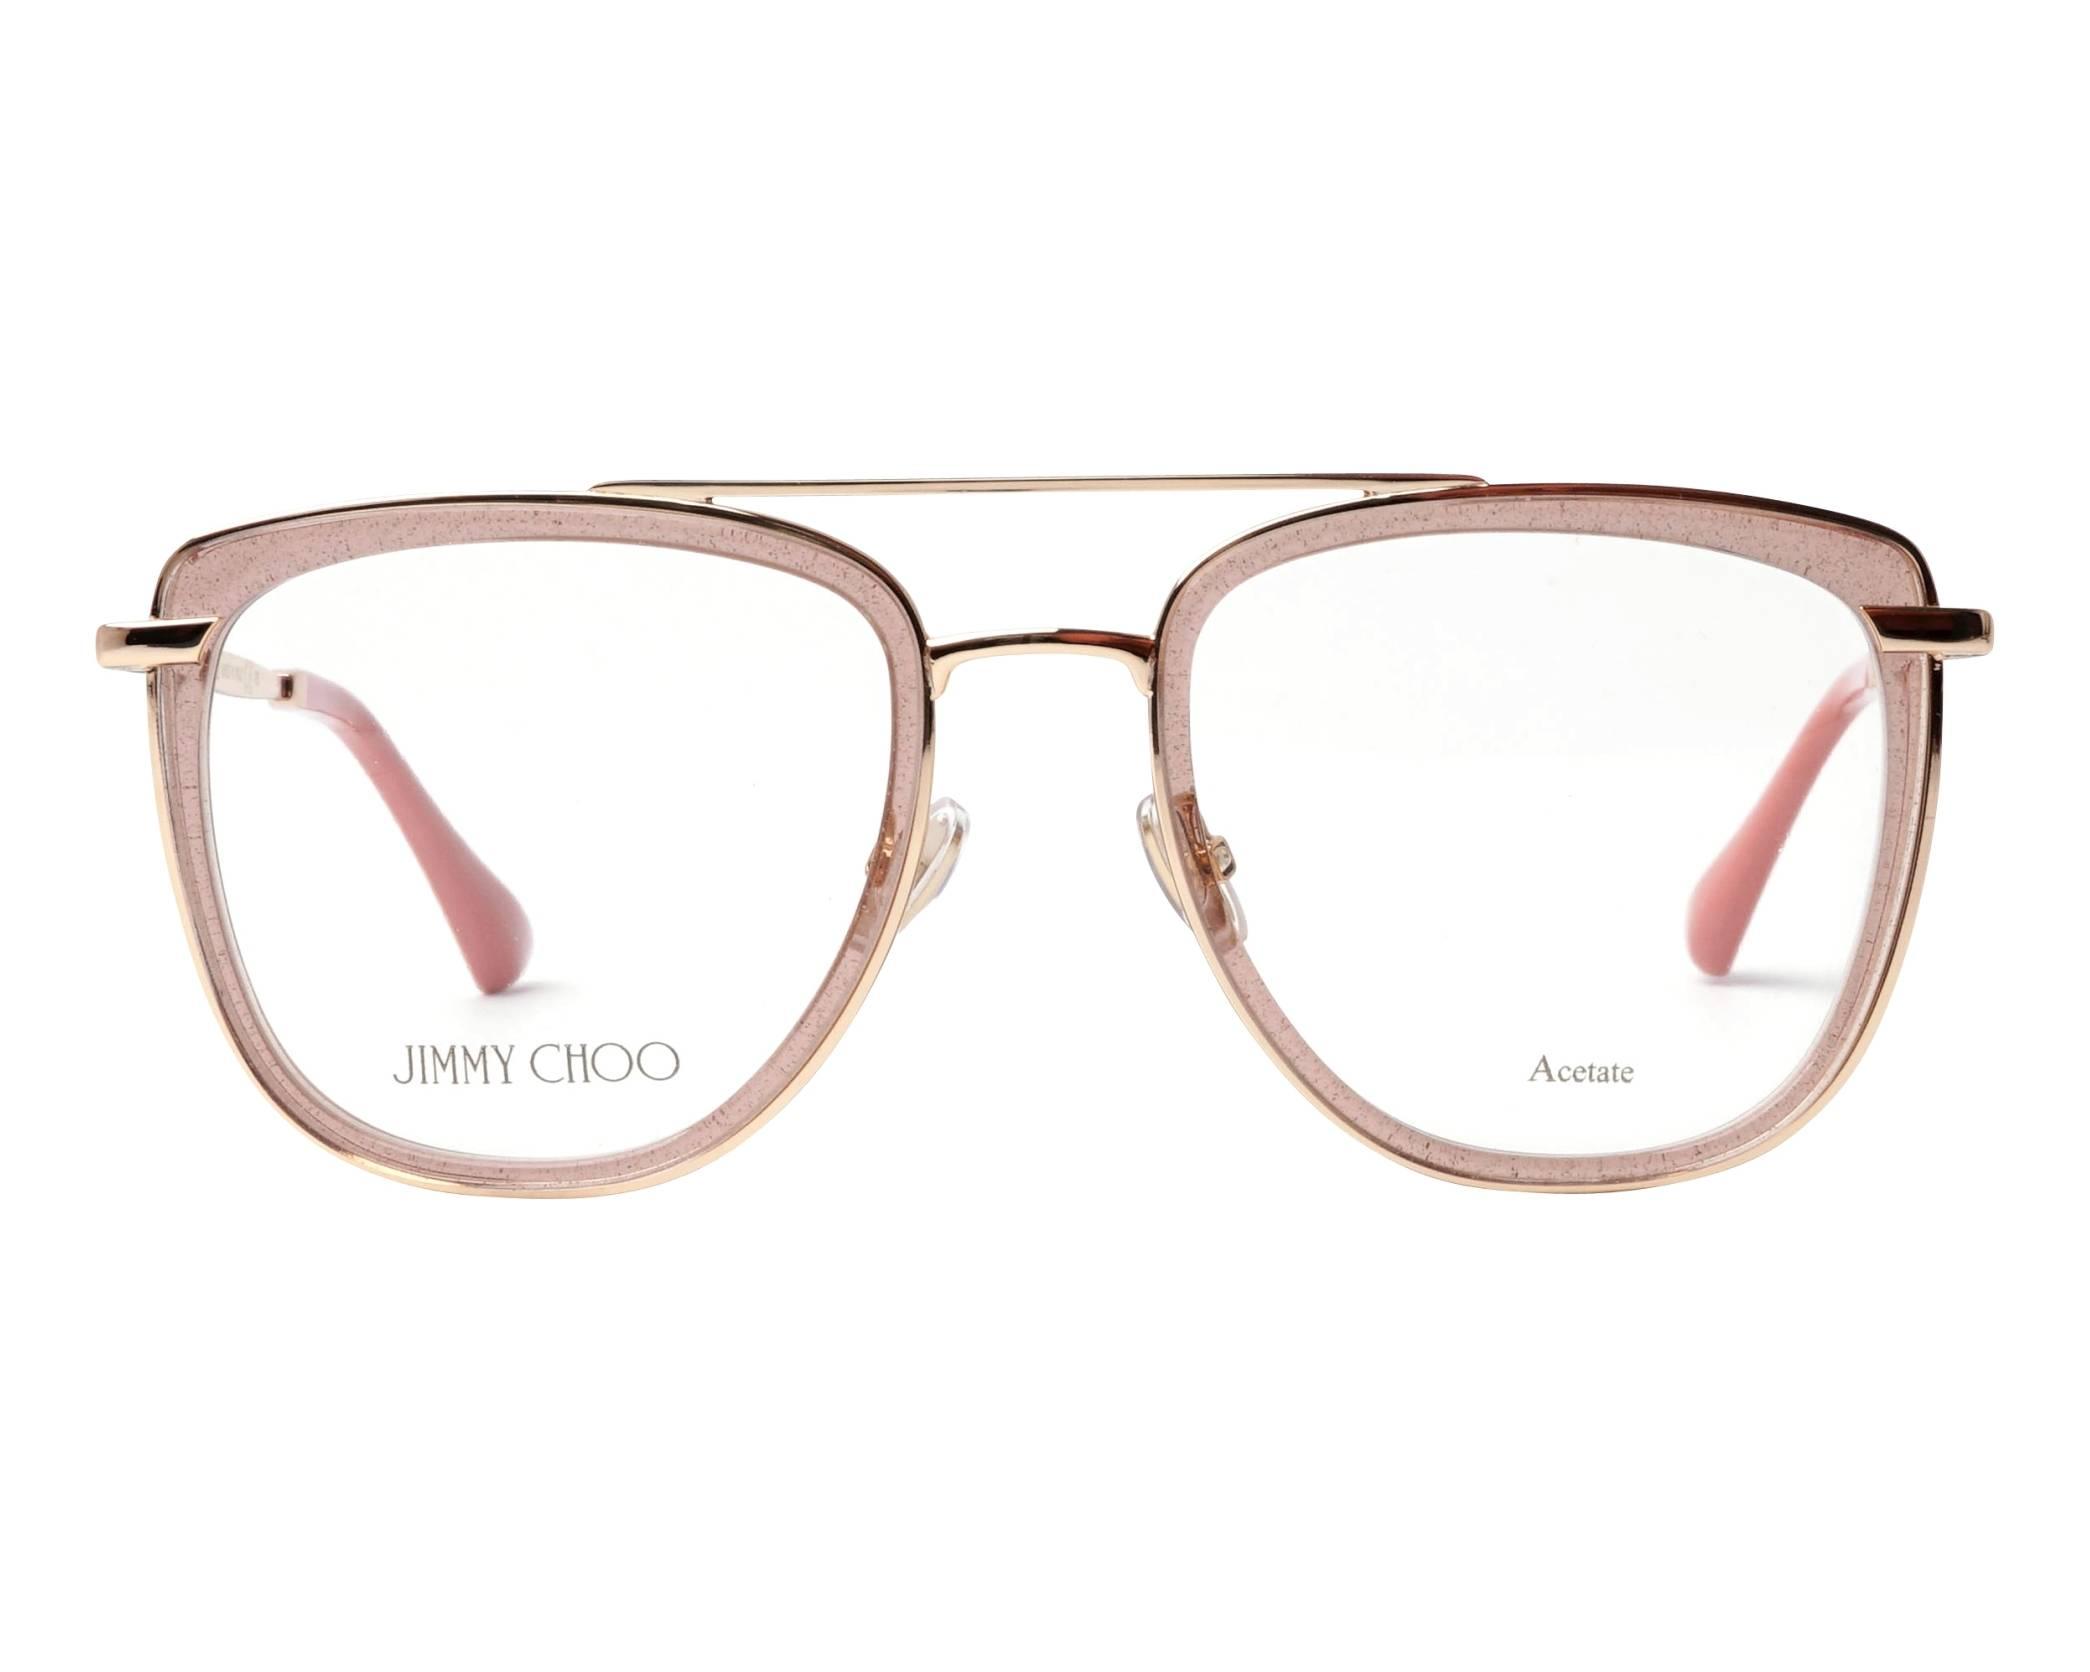 a3d81f444509 eyeglasses Jimmy Choo JC-219 FWM 52-20 Rosa Gold front view